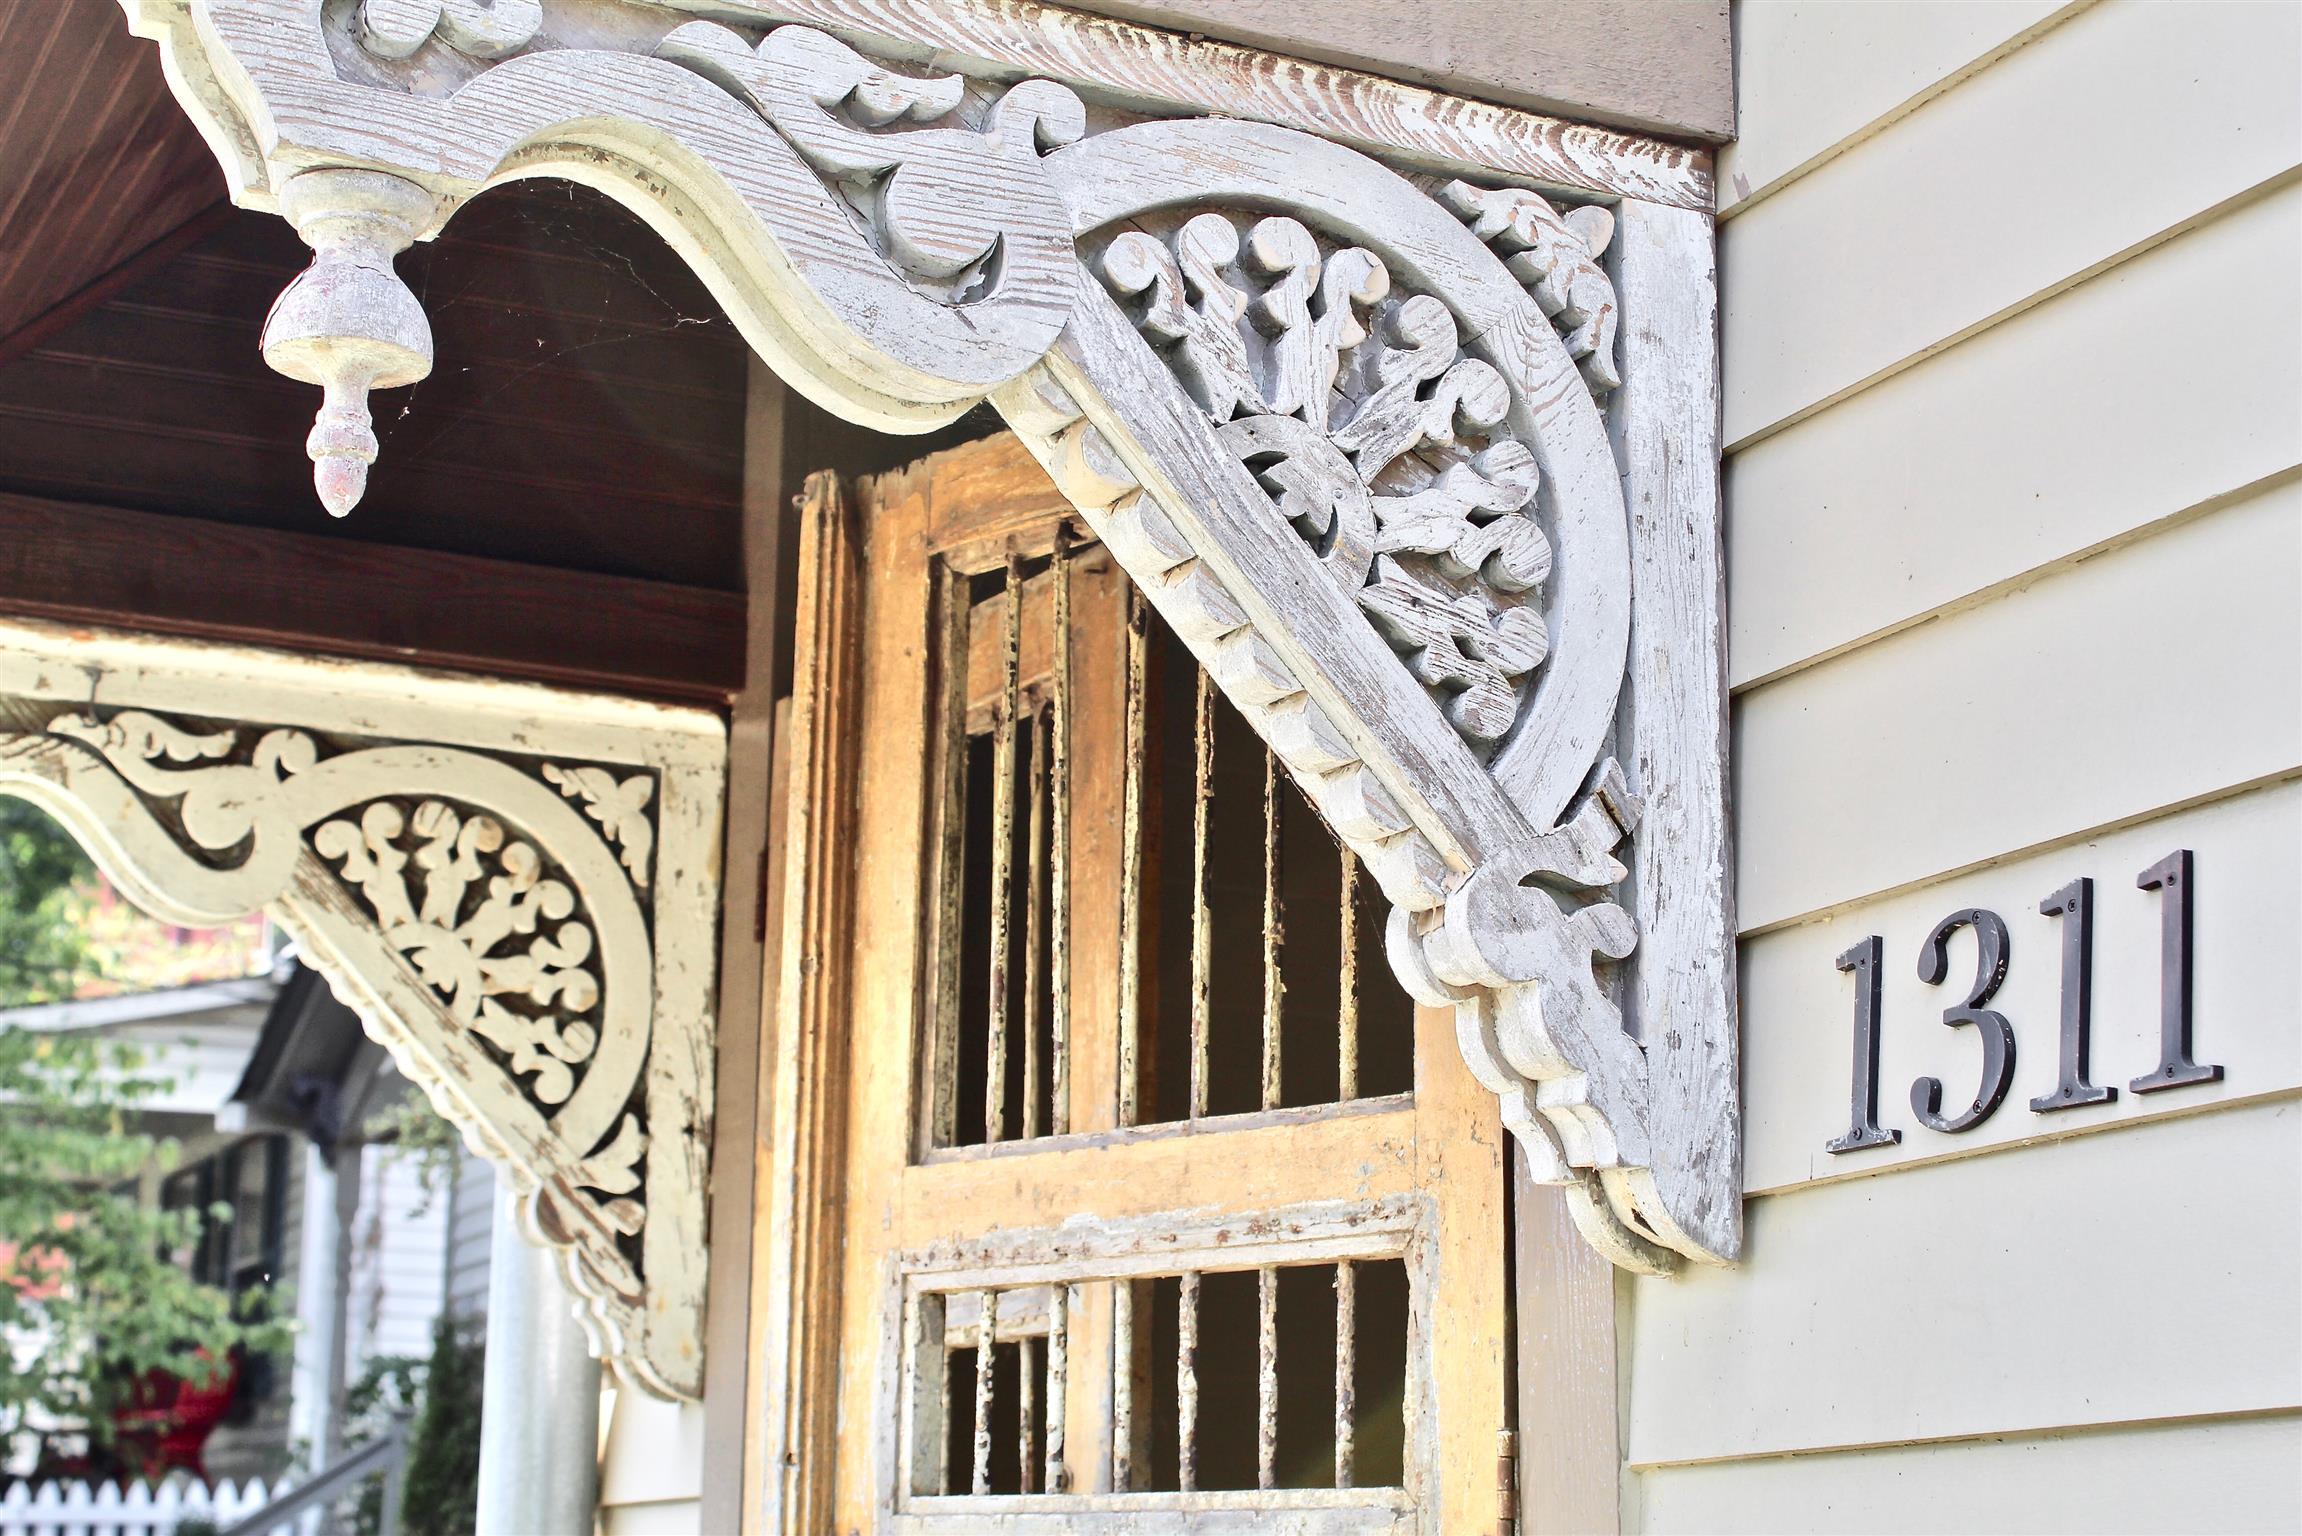 1311 7Th Ave N, Nashville, TN 37208 - Nashville, TN real estate listing